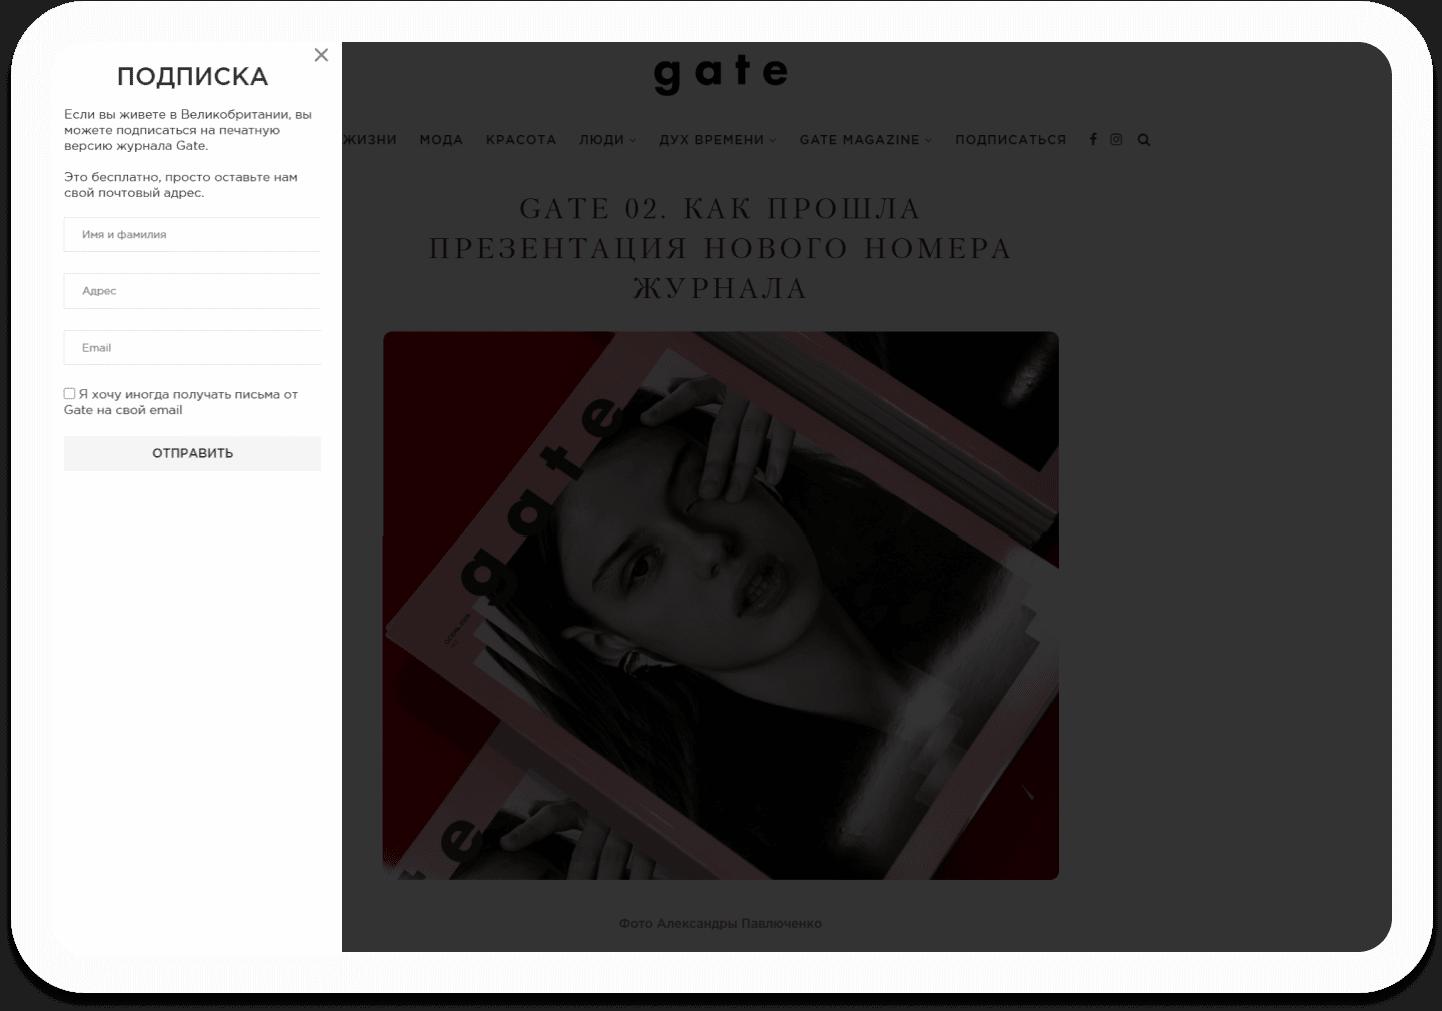 "Журнал о культуре, искусстве и людях ""Gate Magazine"" - https://gatemagazine.co.uk/"